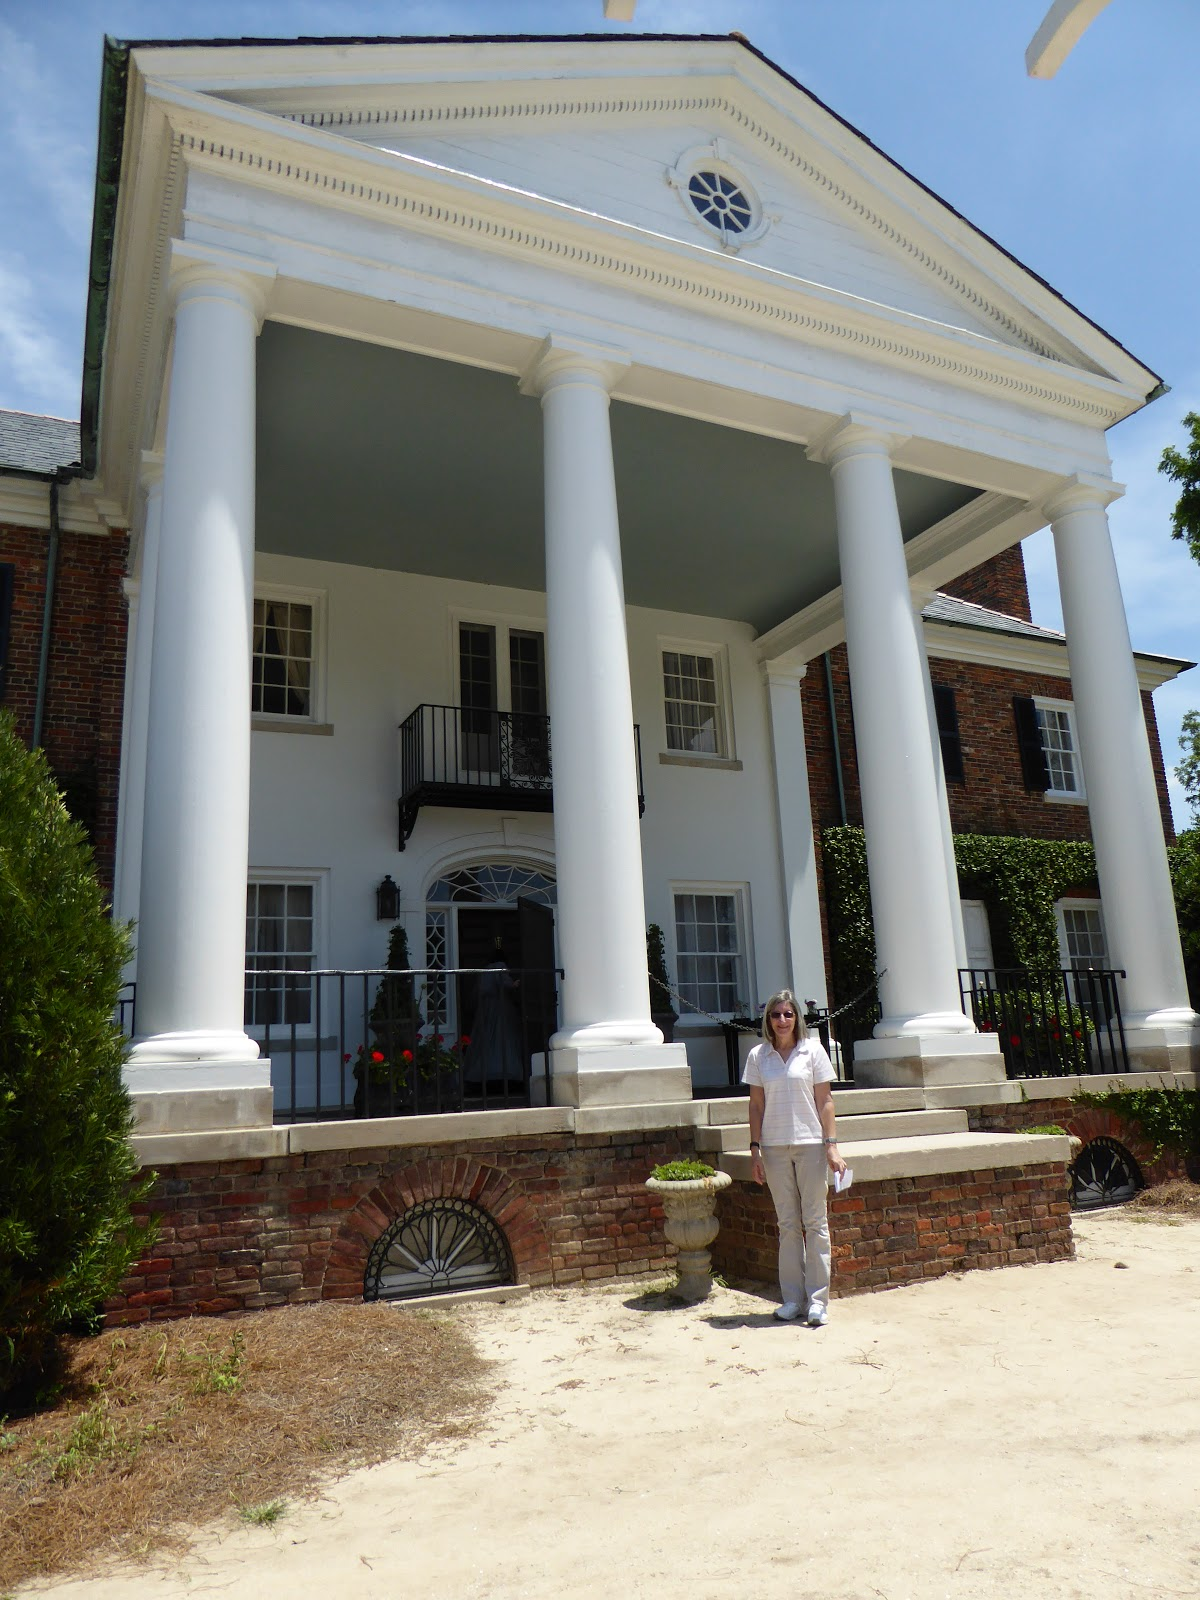 Boone Hall Plantation 2013: C&C Journal: Boone Hall Plantation